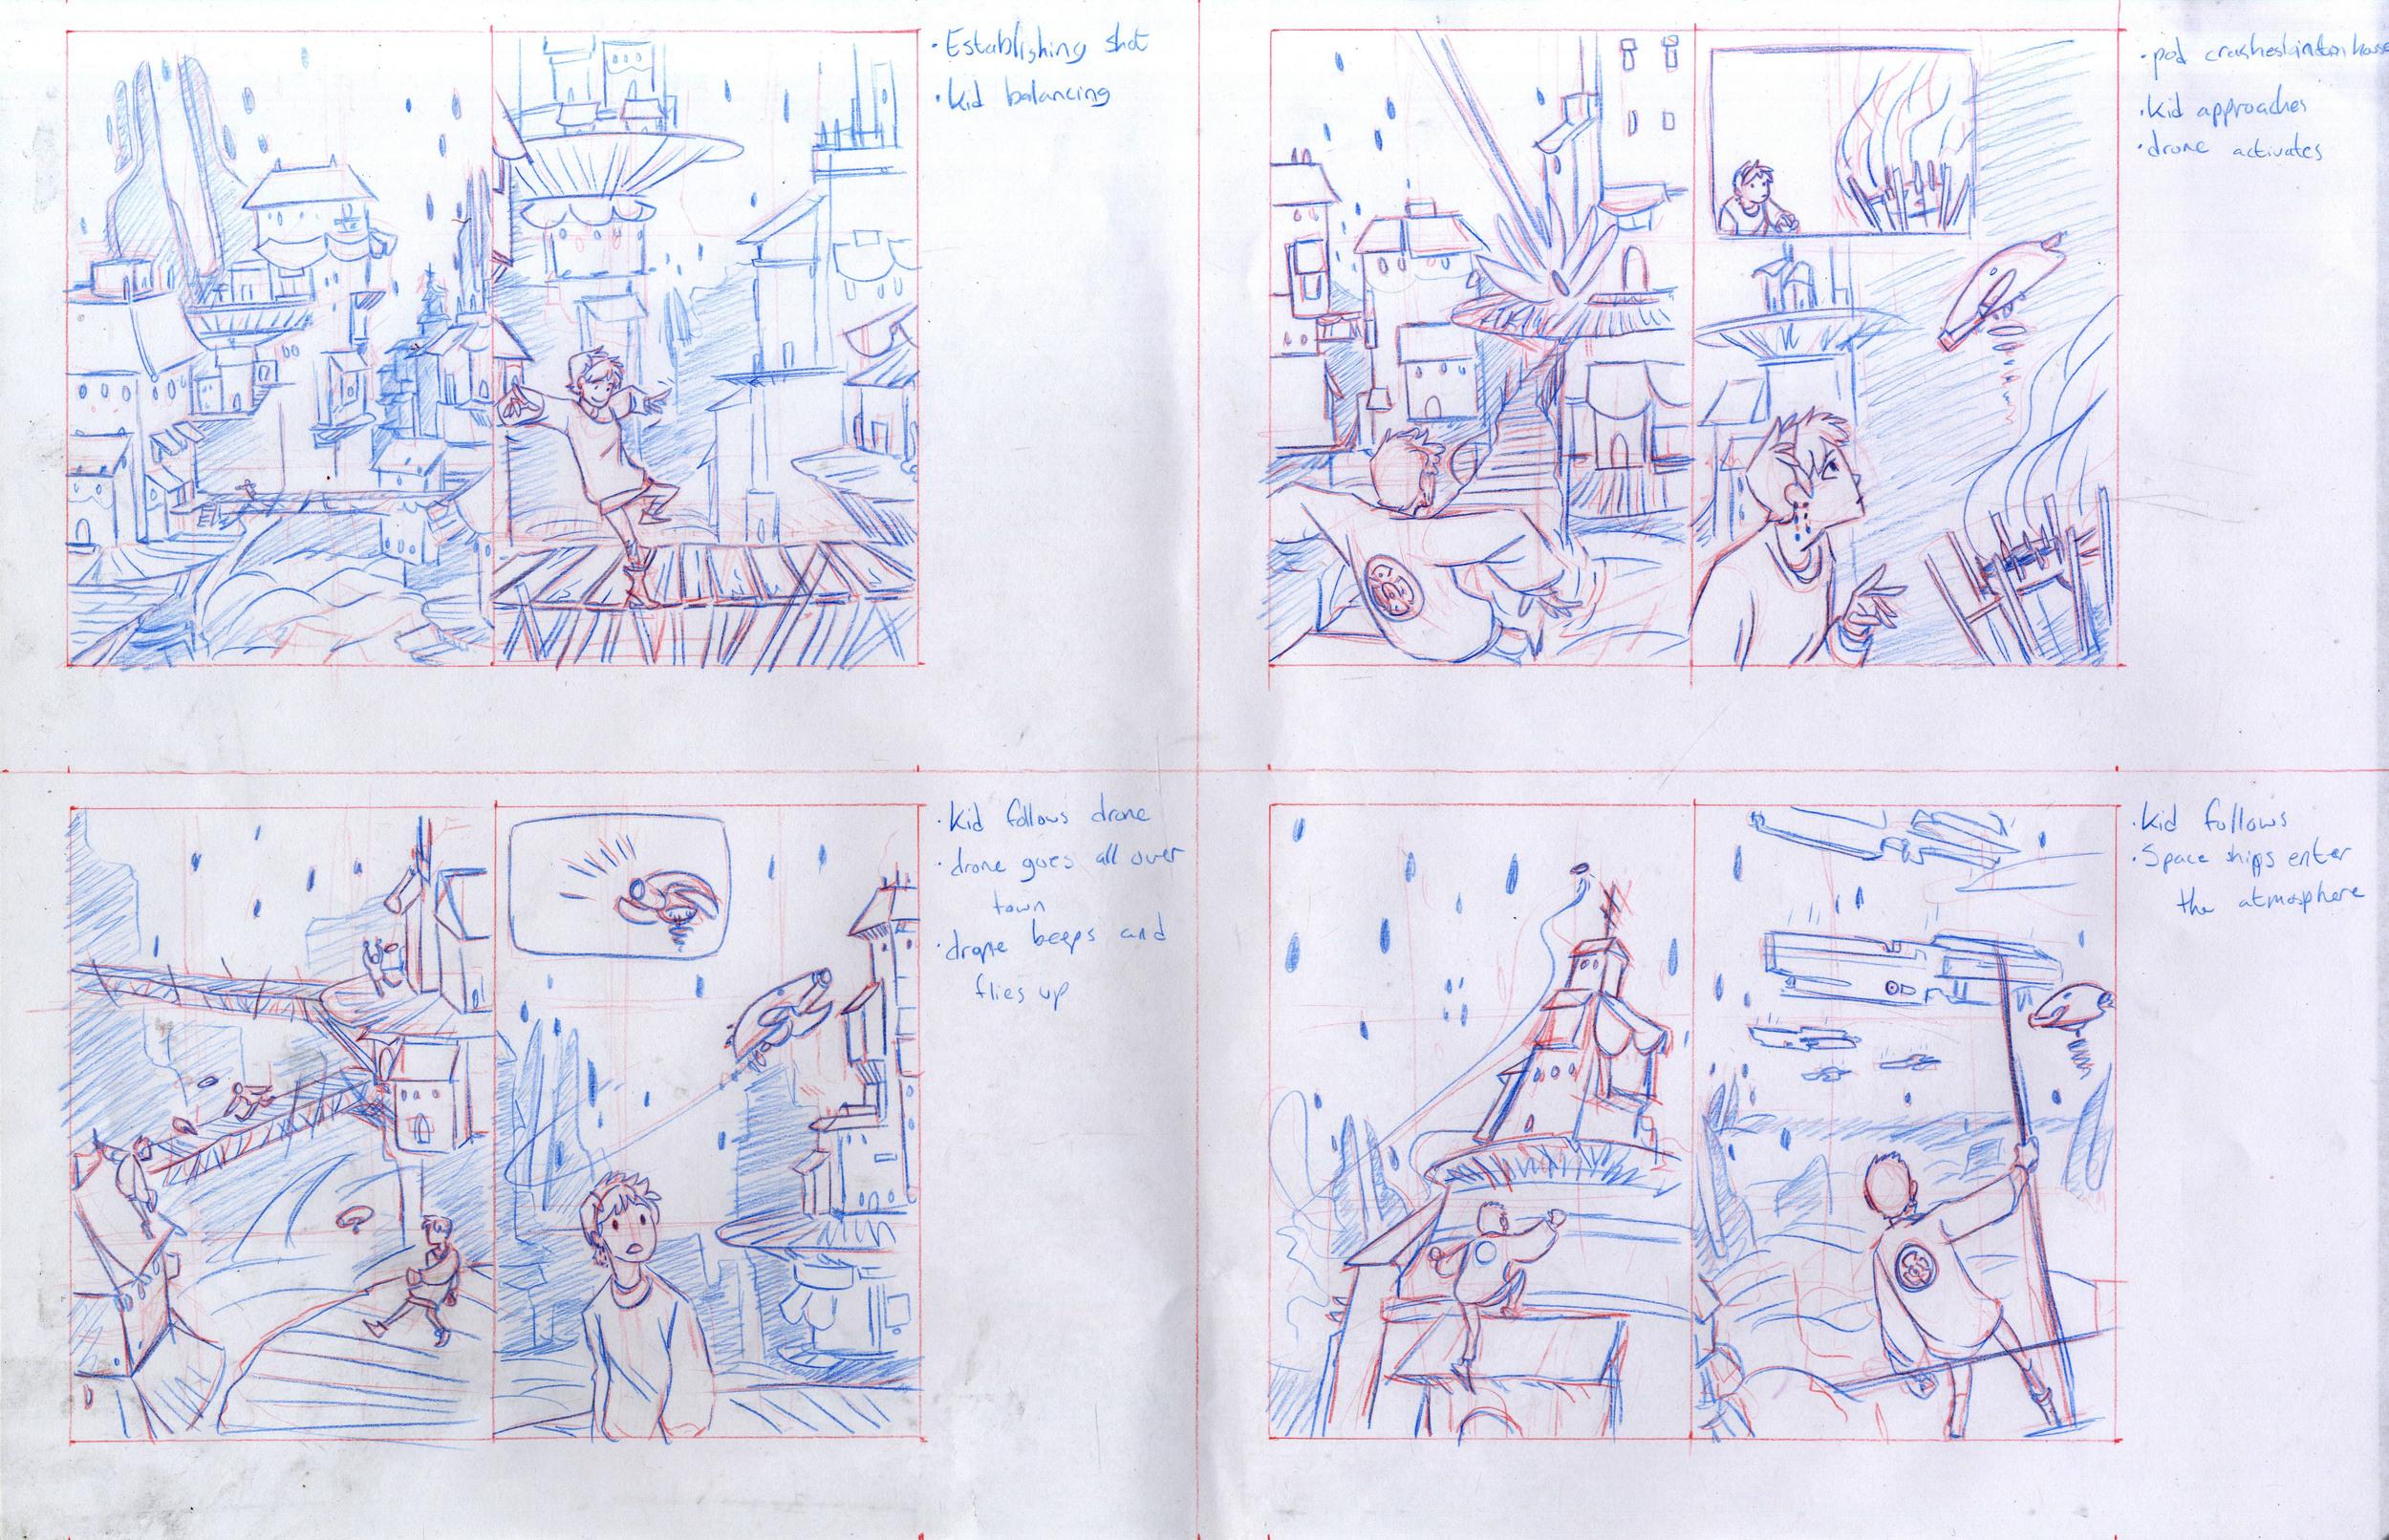 'End of an Era' story 2 storyboard - 2014 -School